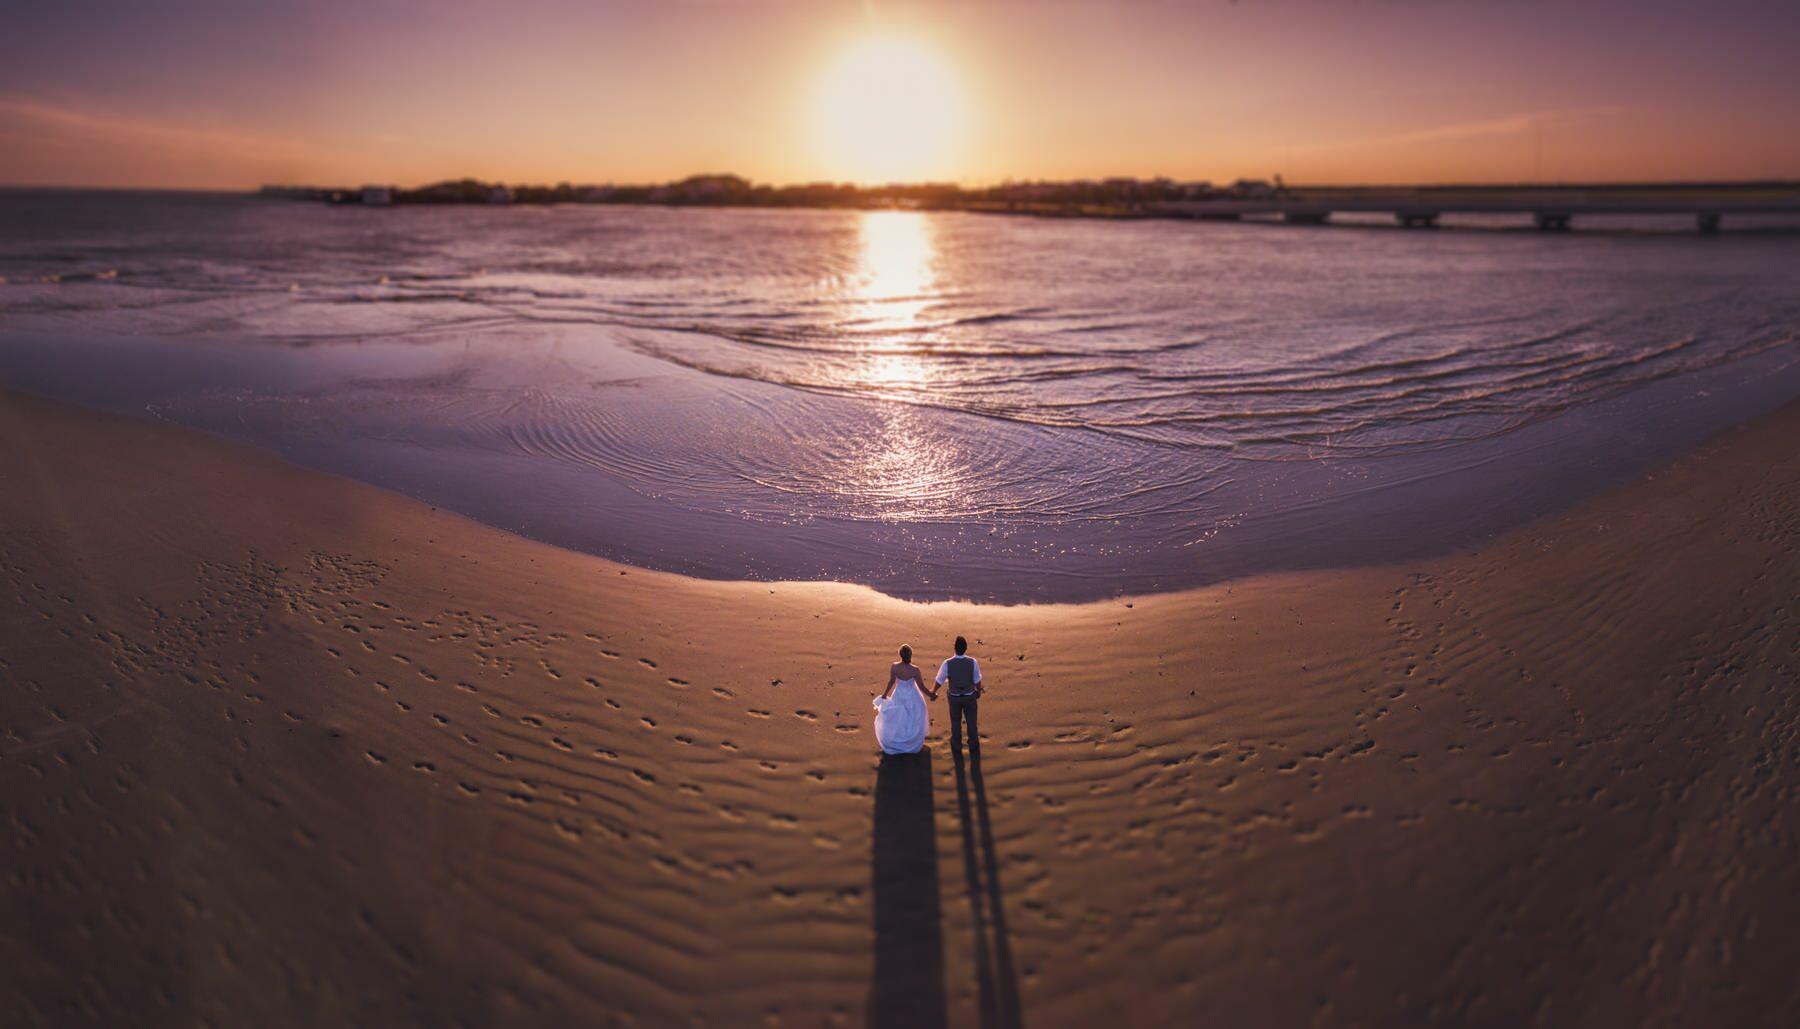 Wedding Photography Charleston Sc: Richard Bell Photography